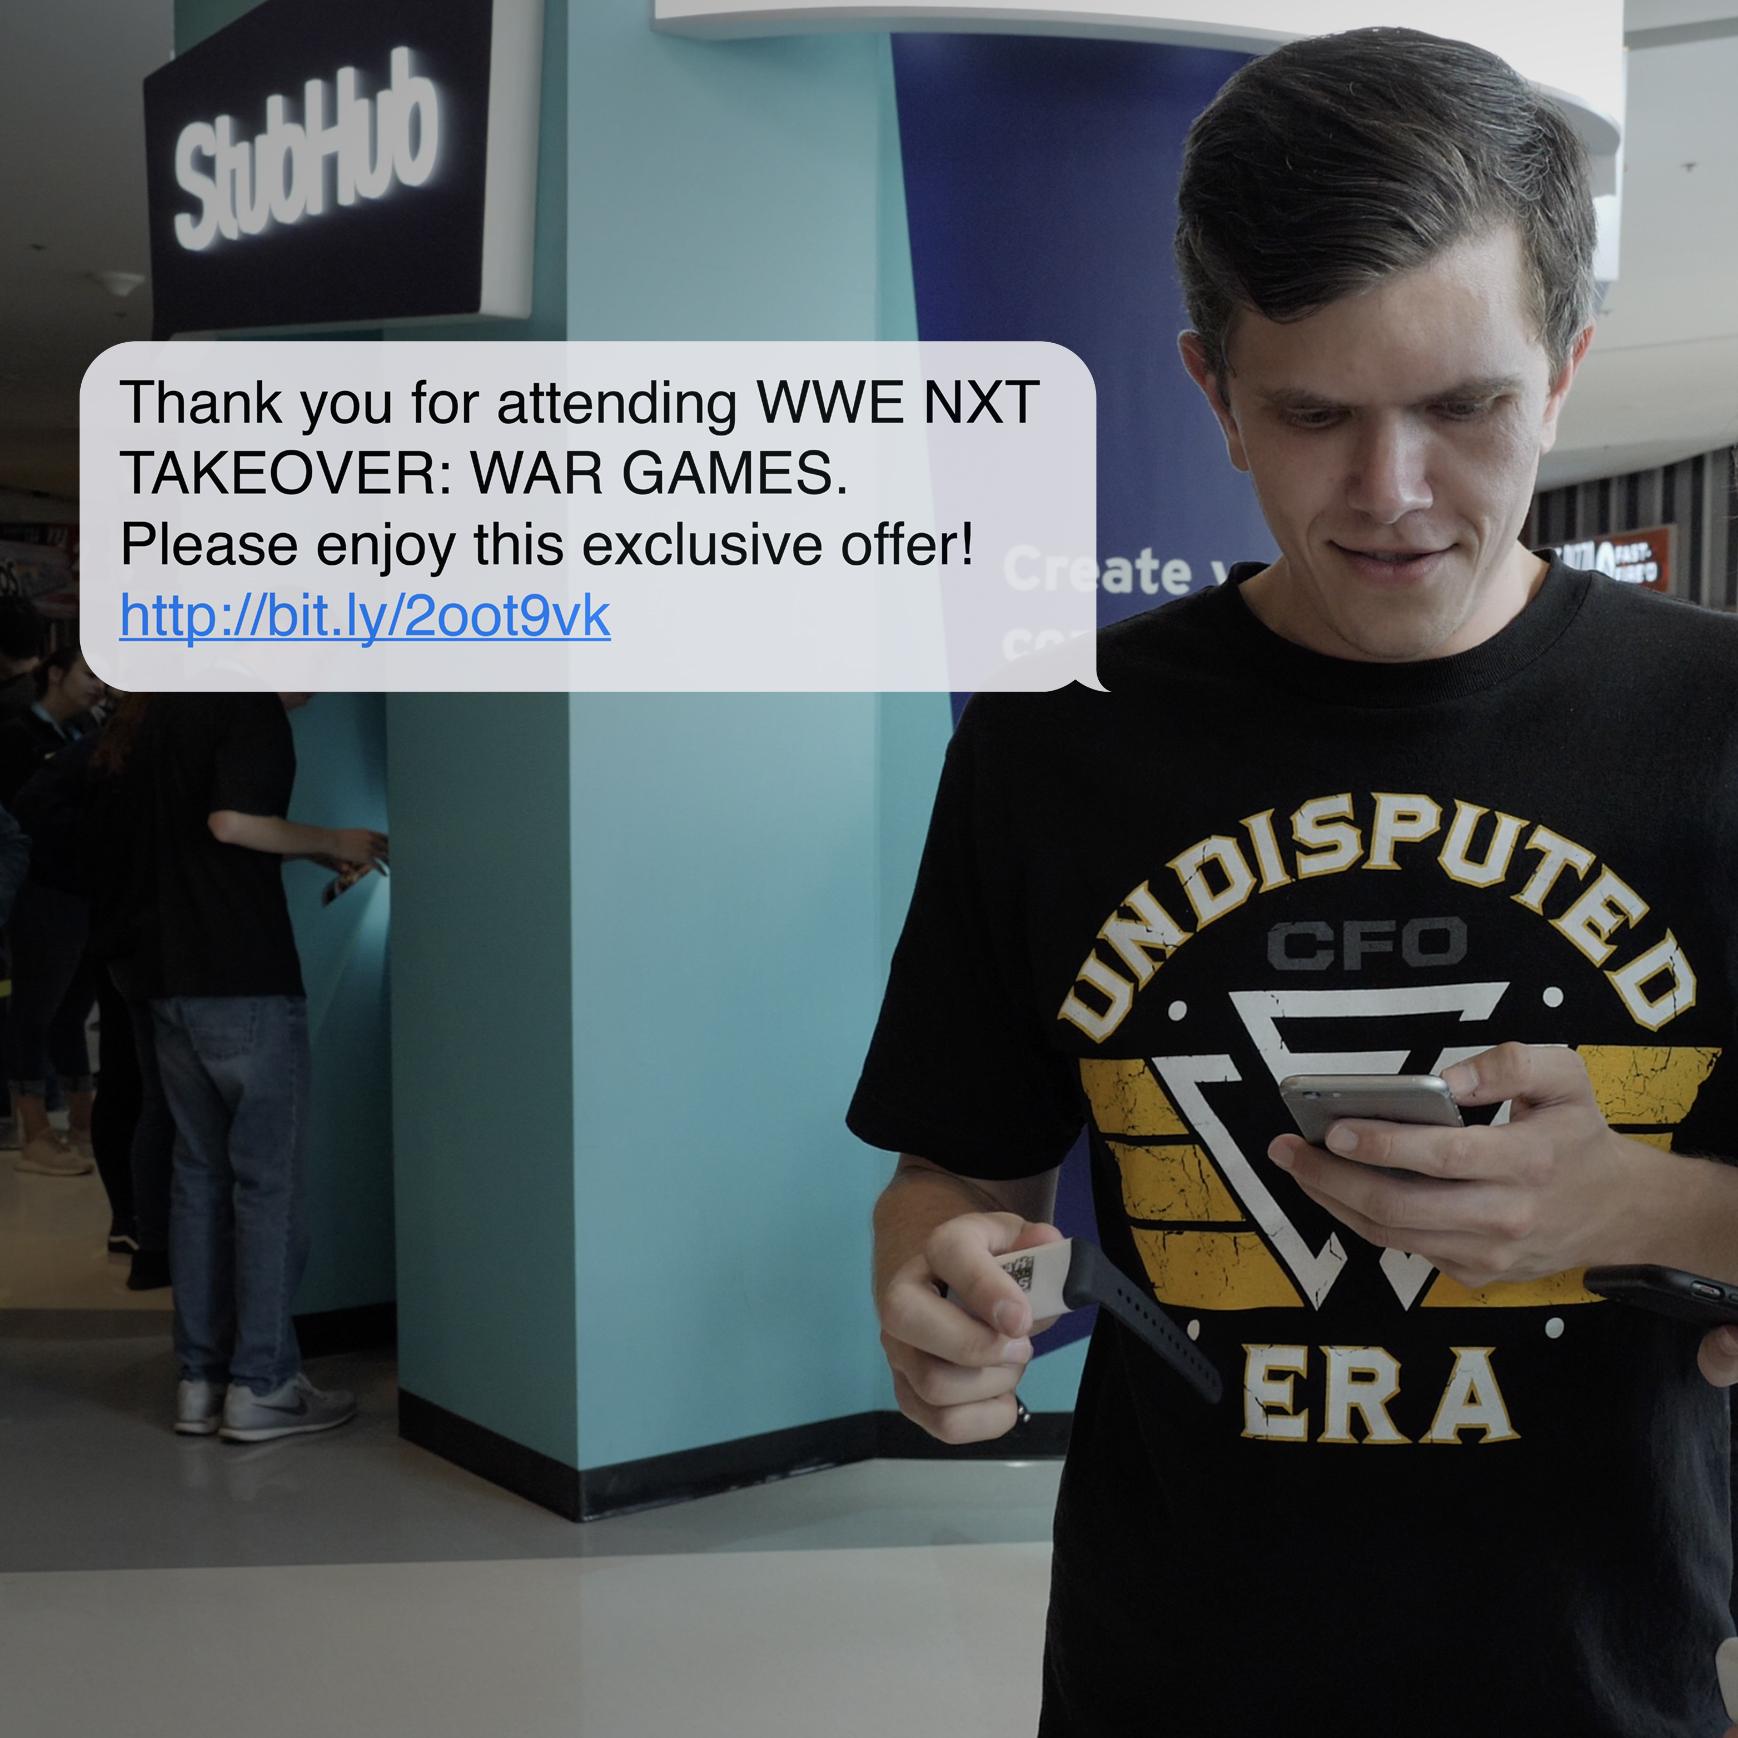 WWE Case Study 2